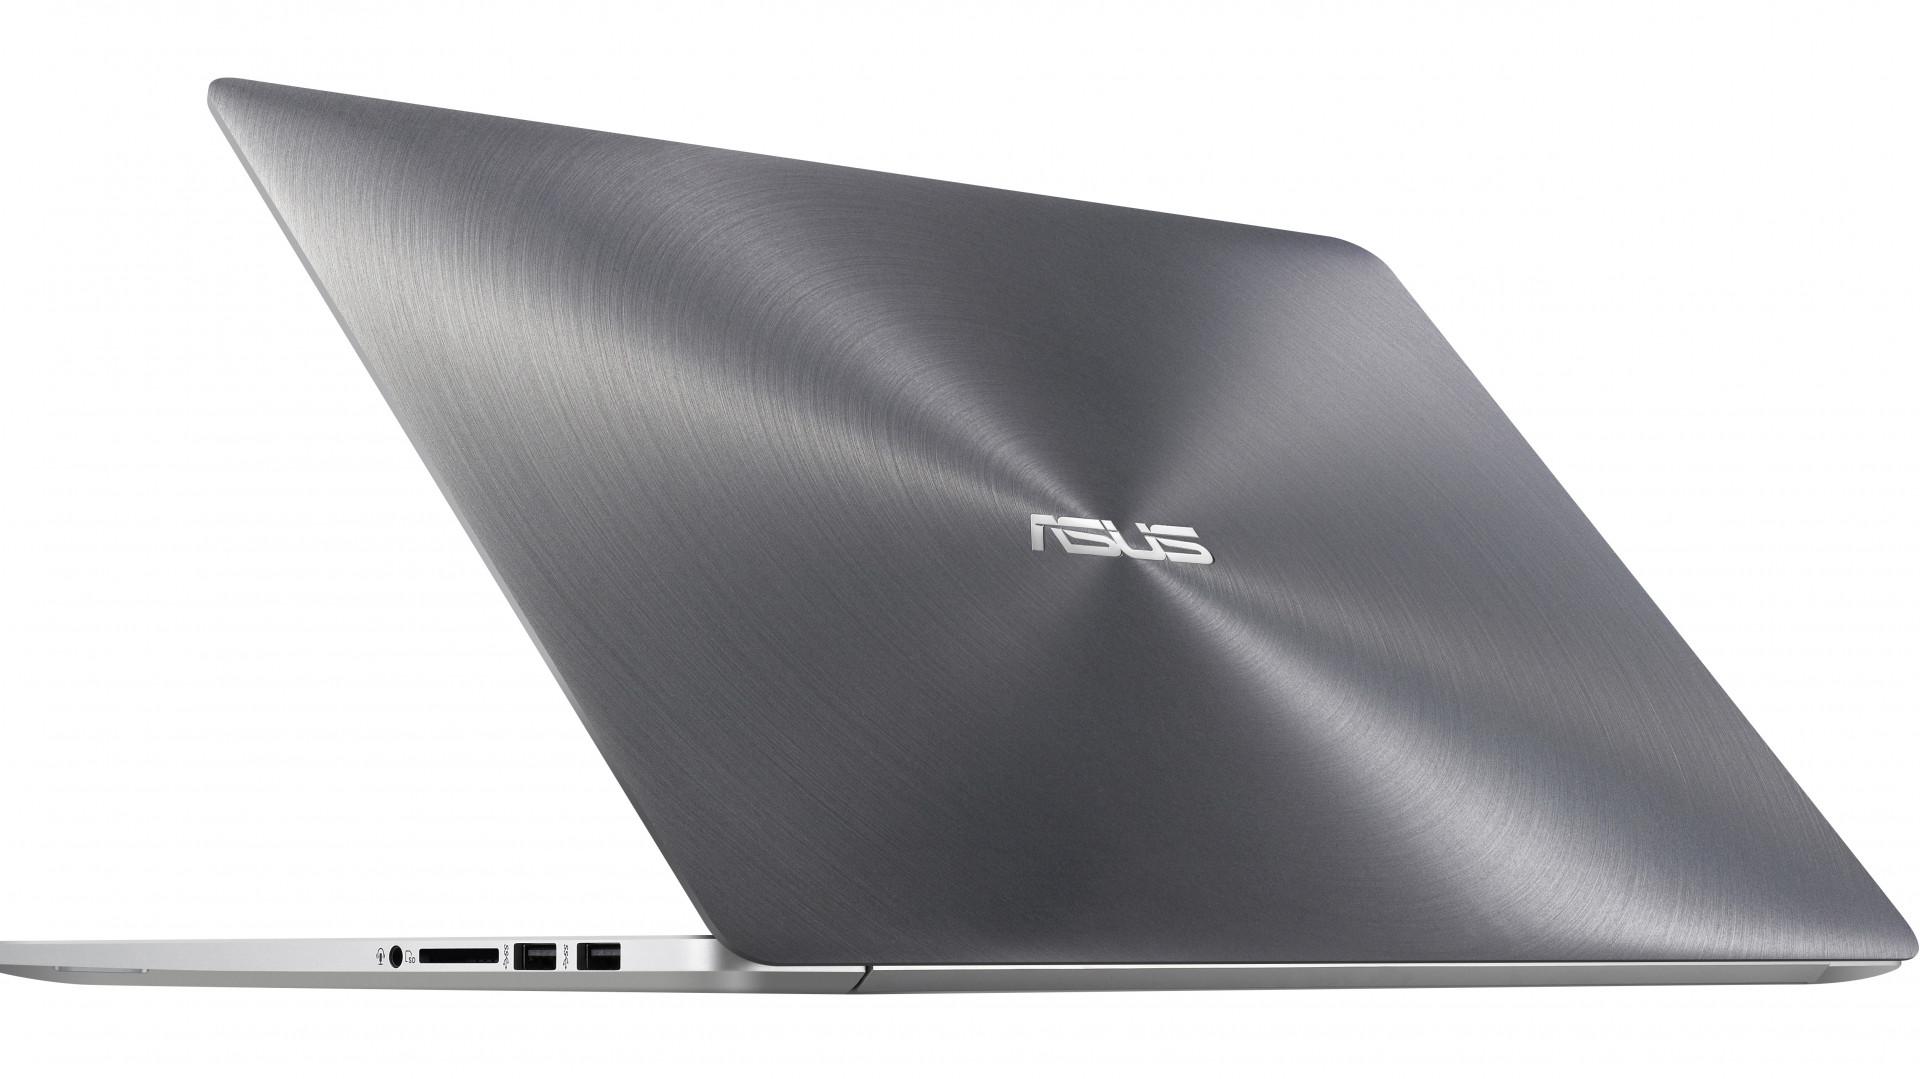 Zenbook UX501: Leistungsstarkes 15-Zoll-Notebook mit 4K-Bildschirm